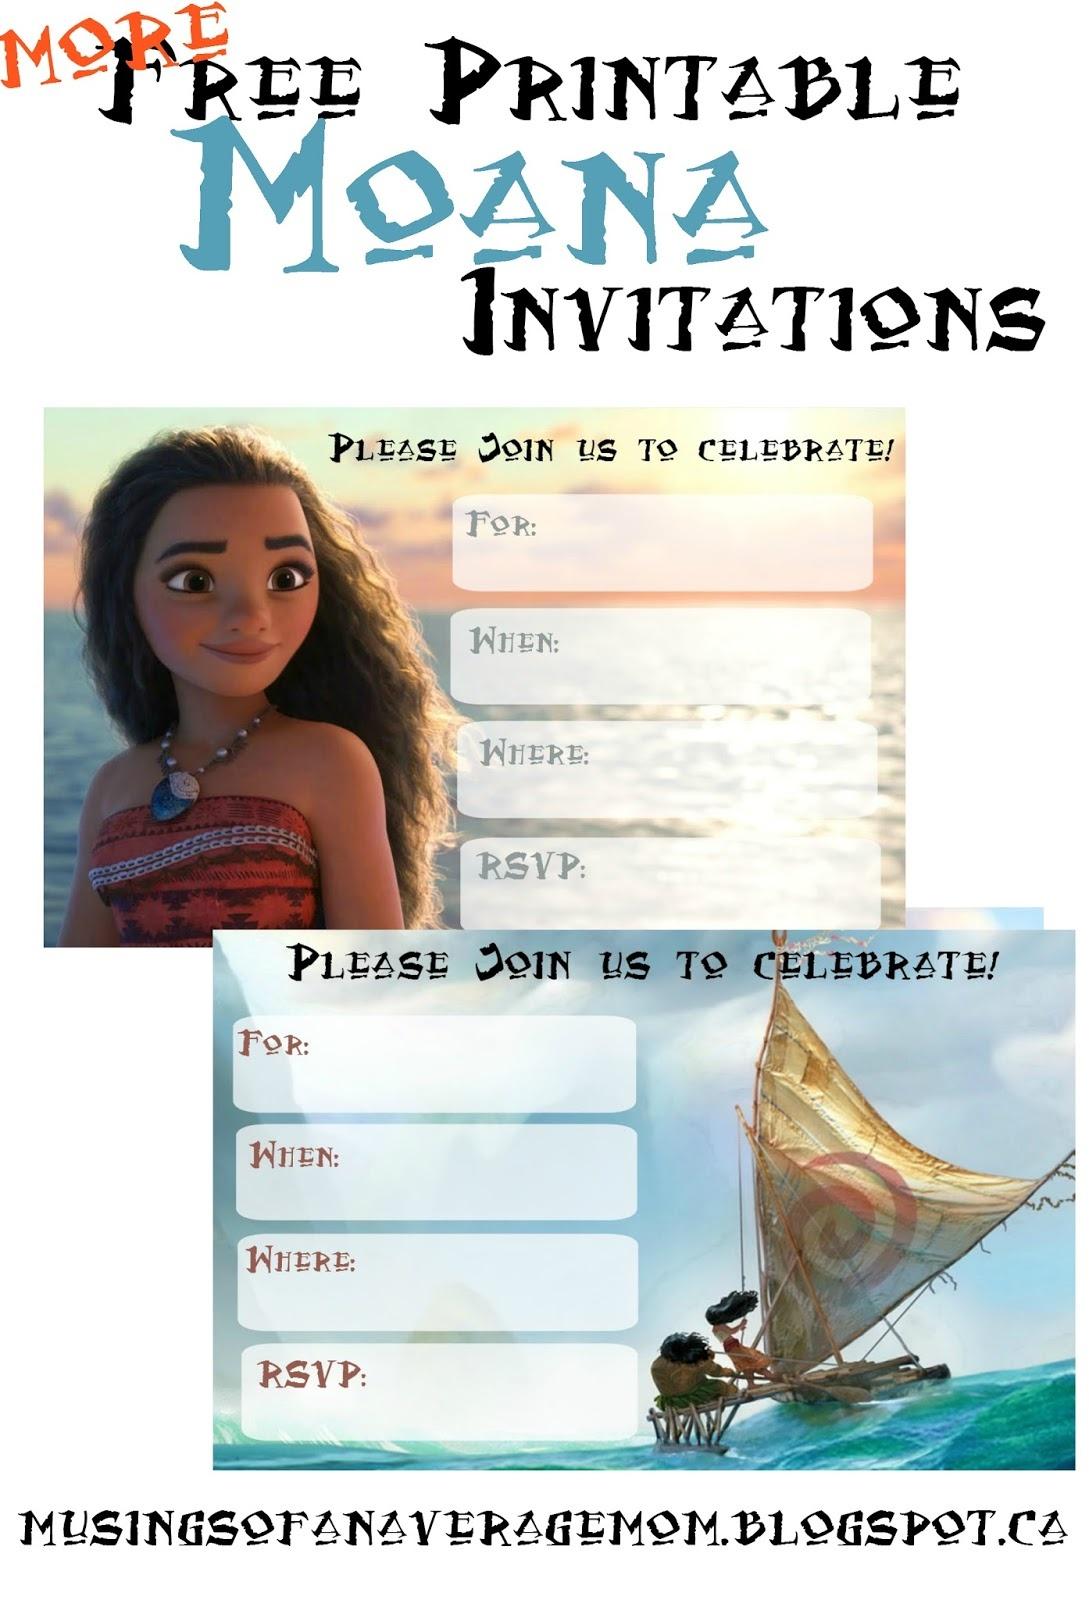 Musings Of An Average Mom: Free Printable Moana Invitations 2 - Free Printable Moana Birthday Invitations